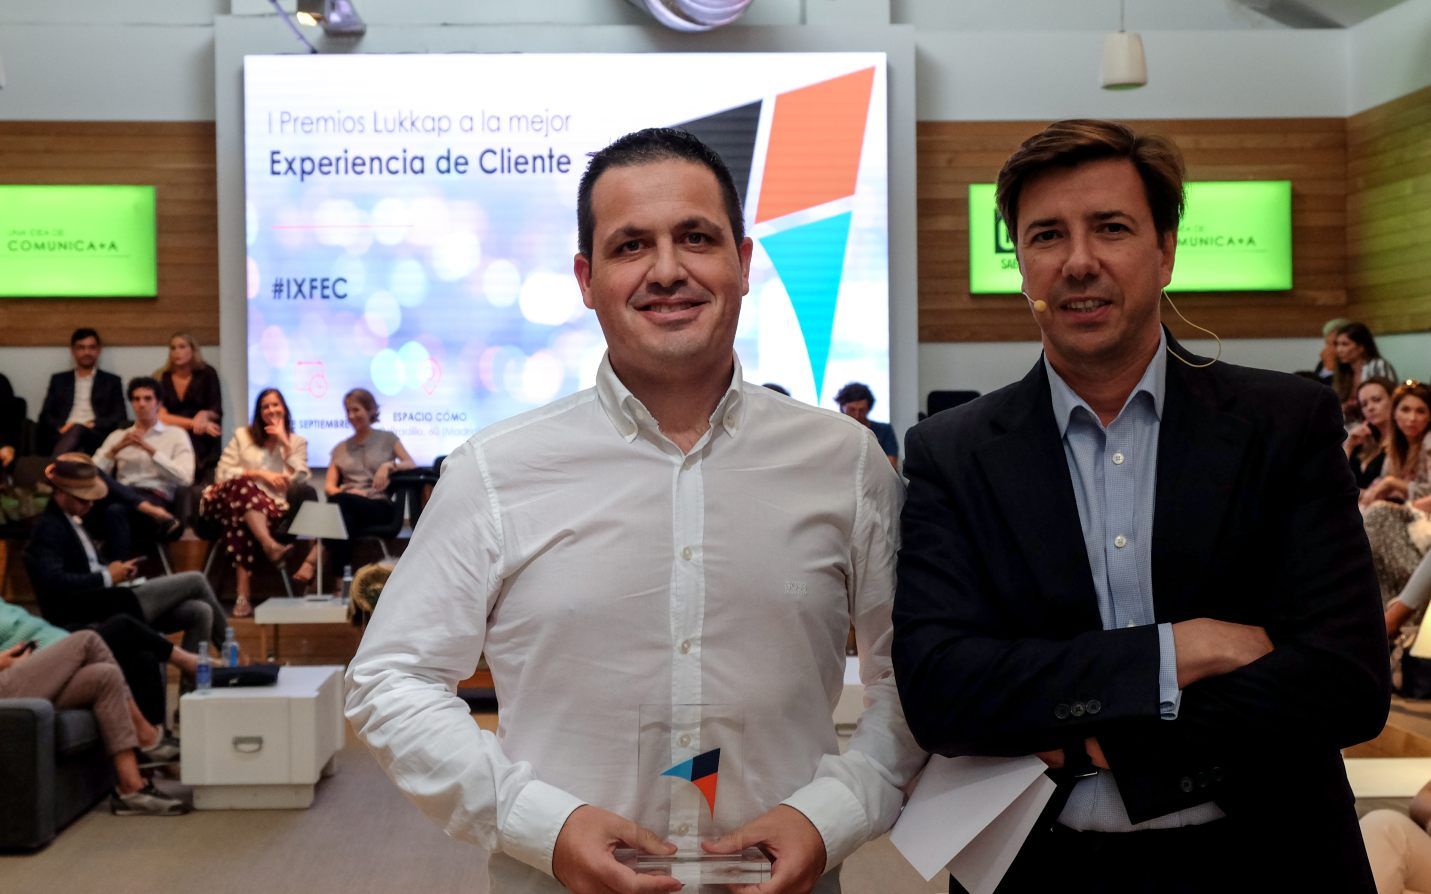 Premio Lukapp - Luis Aledo, PC Componentes